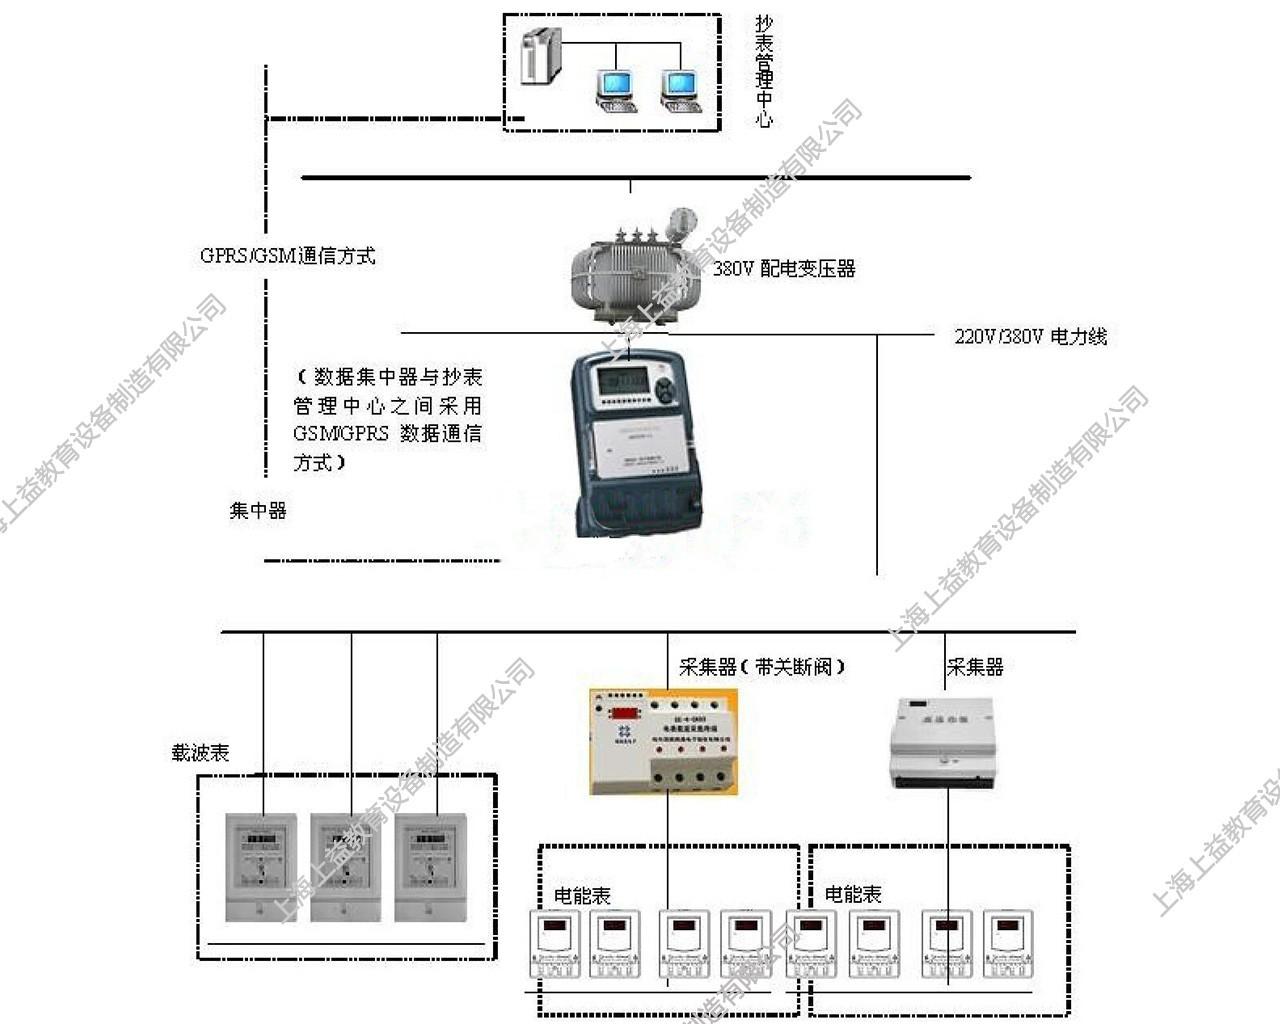 SYDLX-09抄表核算员培训lehu68vip装置